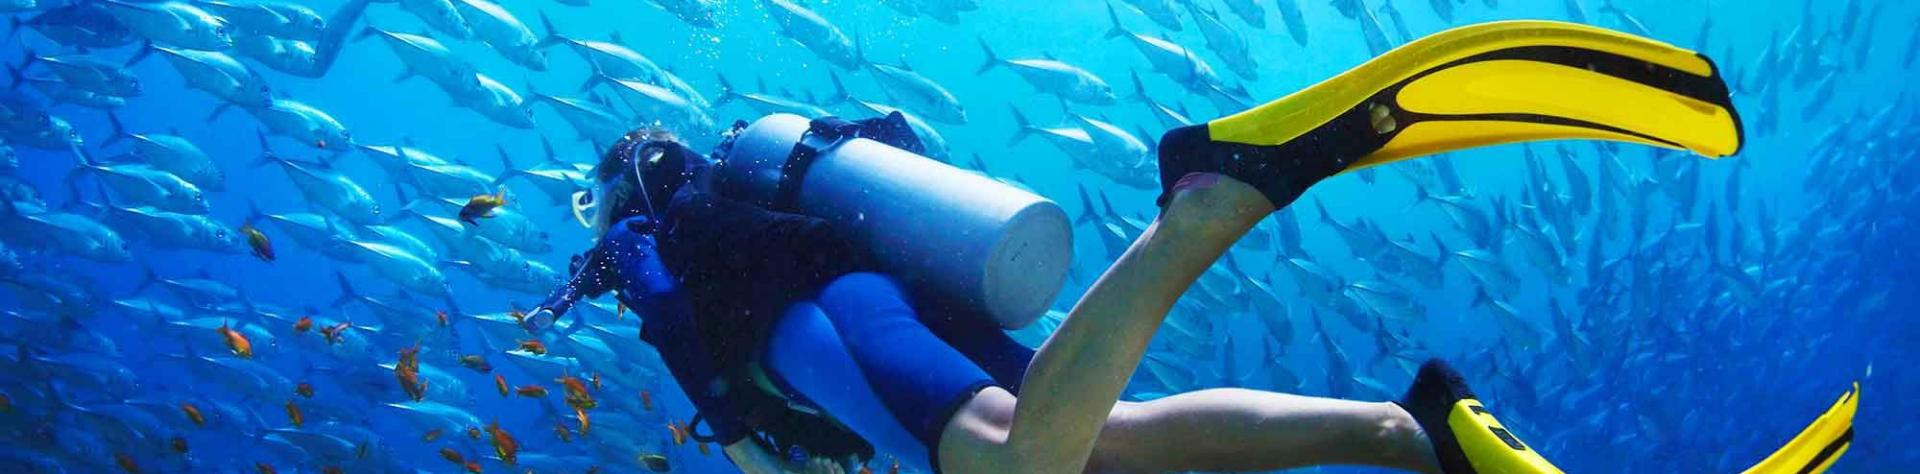 Scuba Diving Package